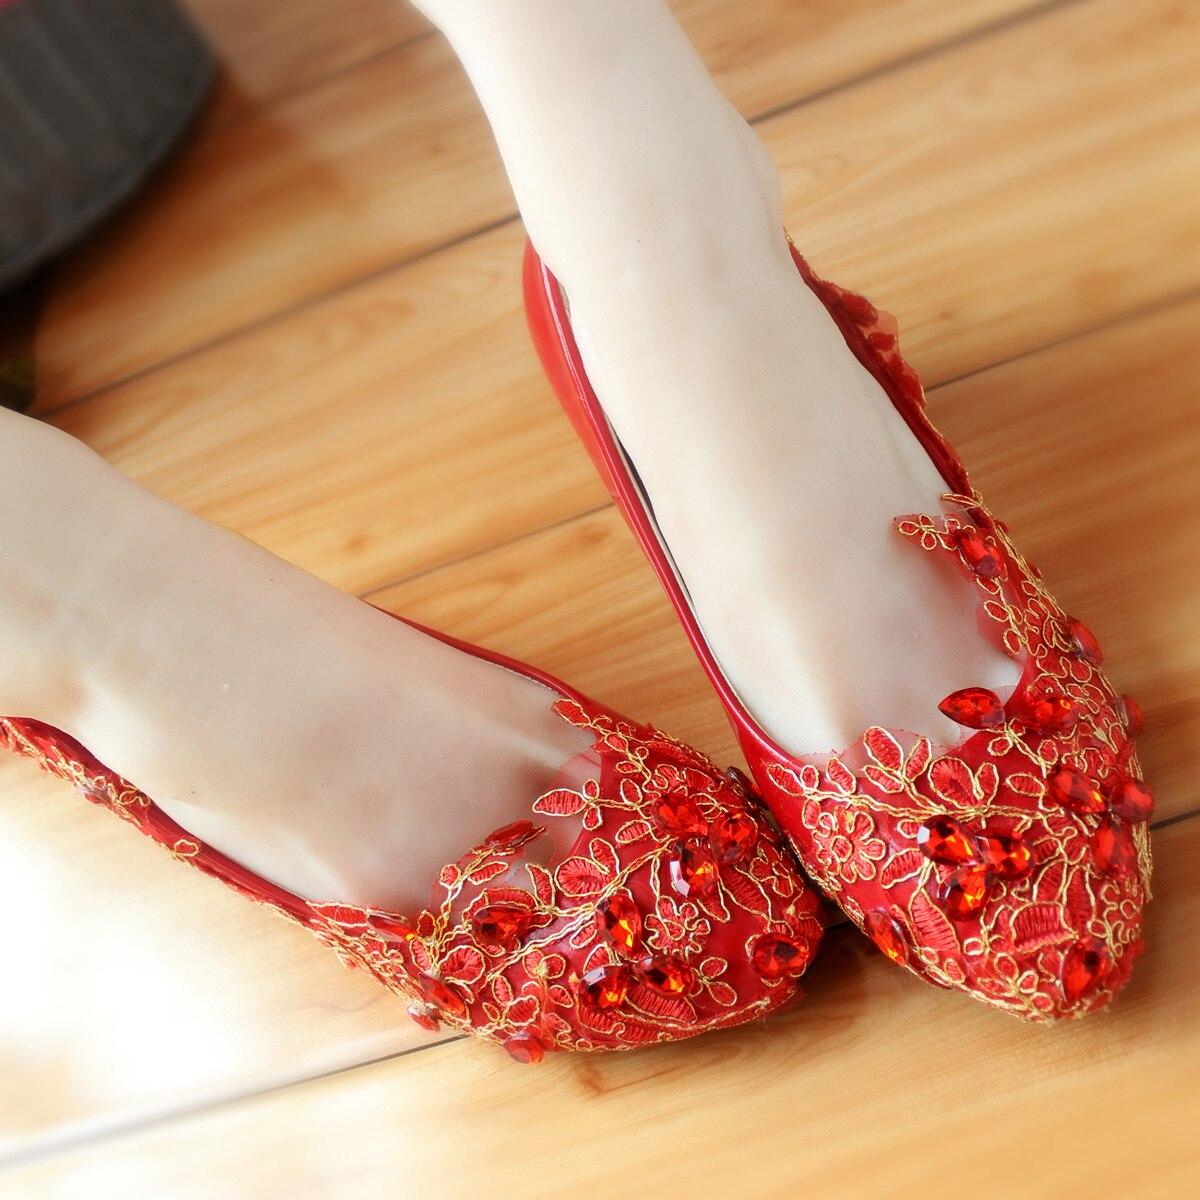 Chinese Wedding Shoes size 5